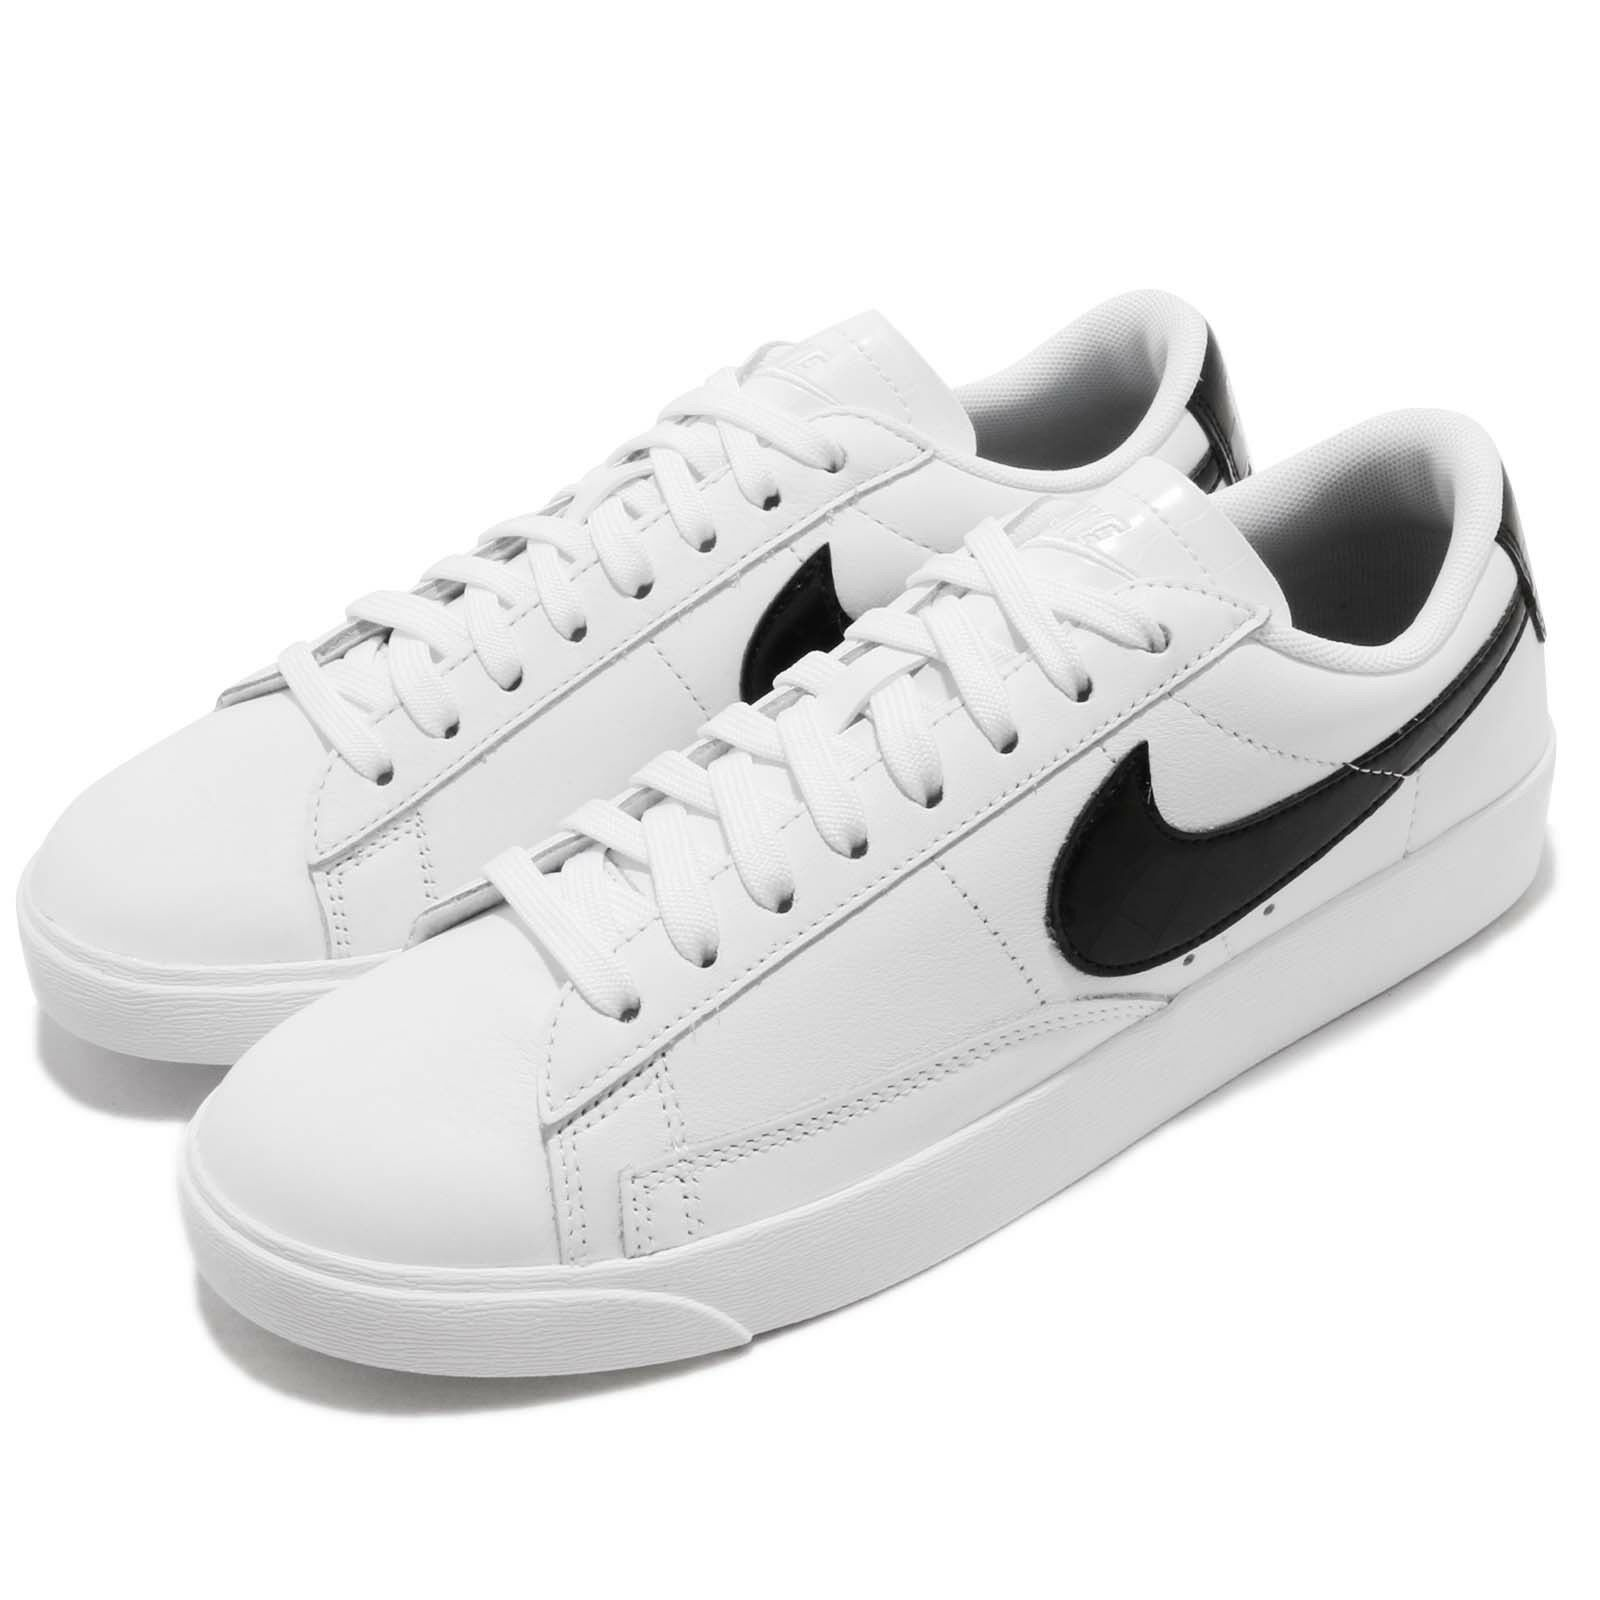 Nike Wmns Blazer Low bianca nero donna Casual Lifestyle scarpe scarpe da ginnastica BQ0033-100